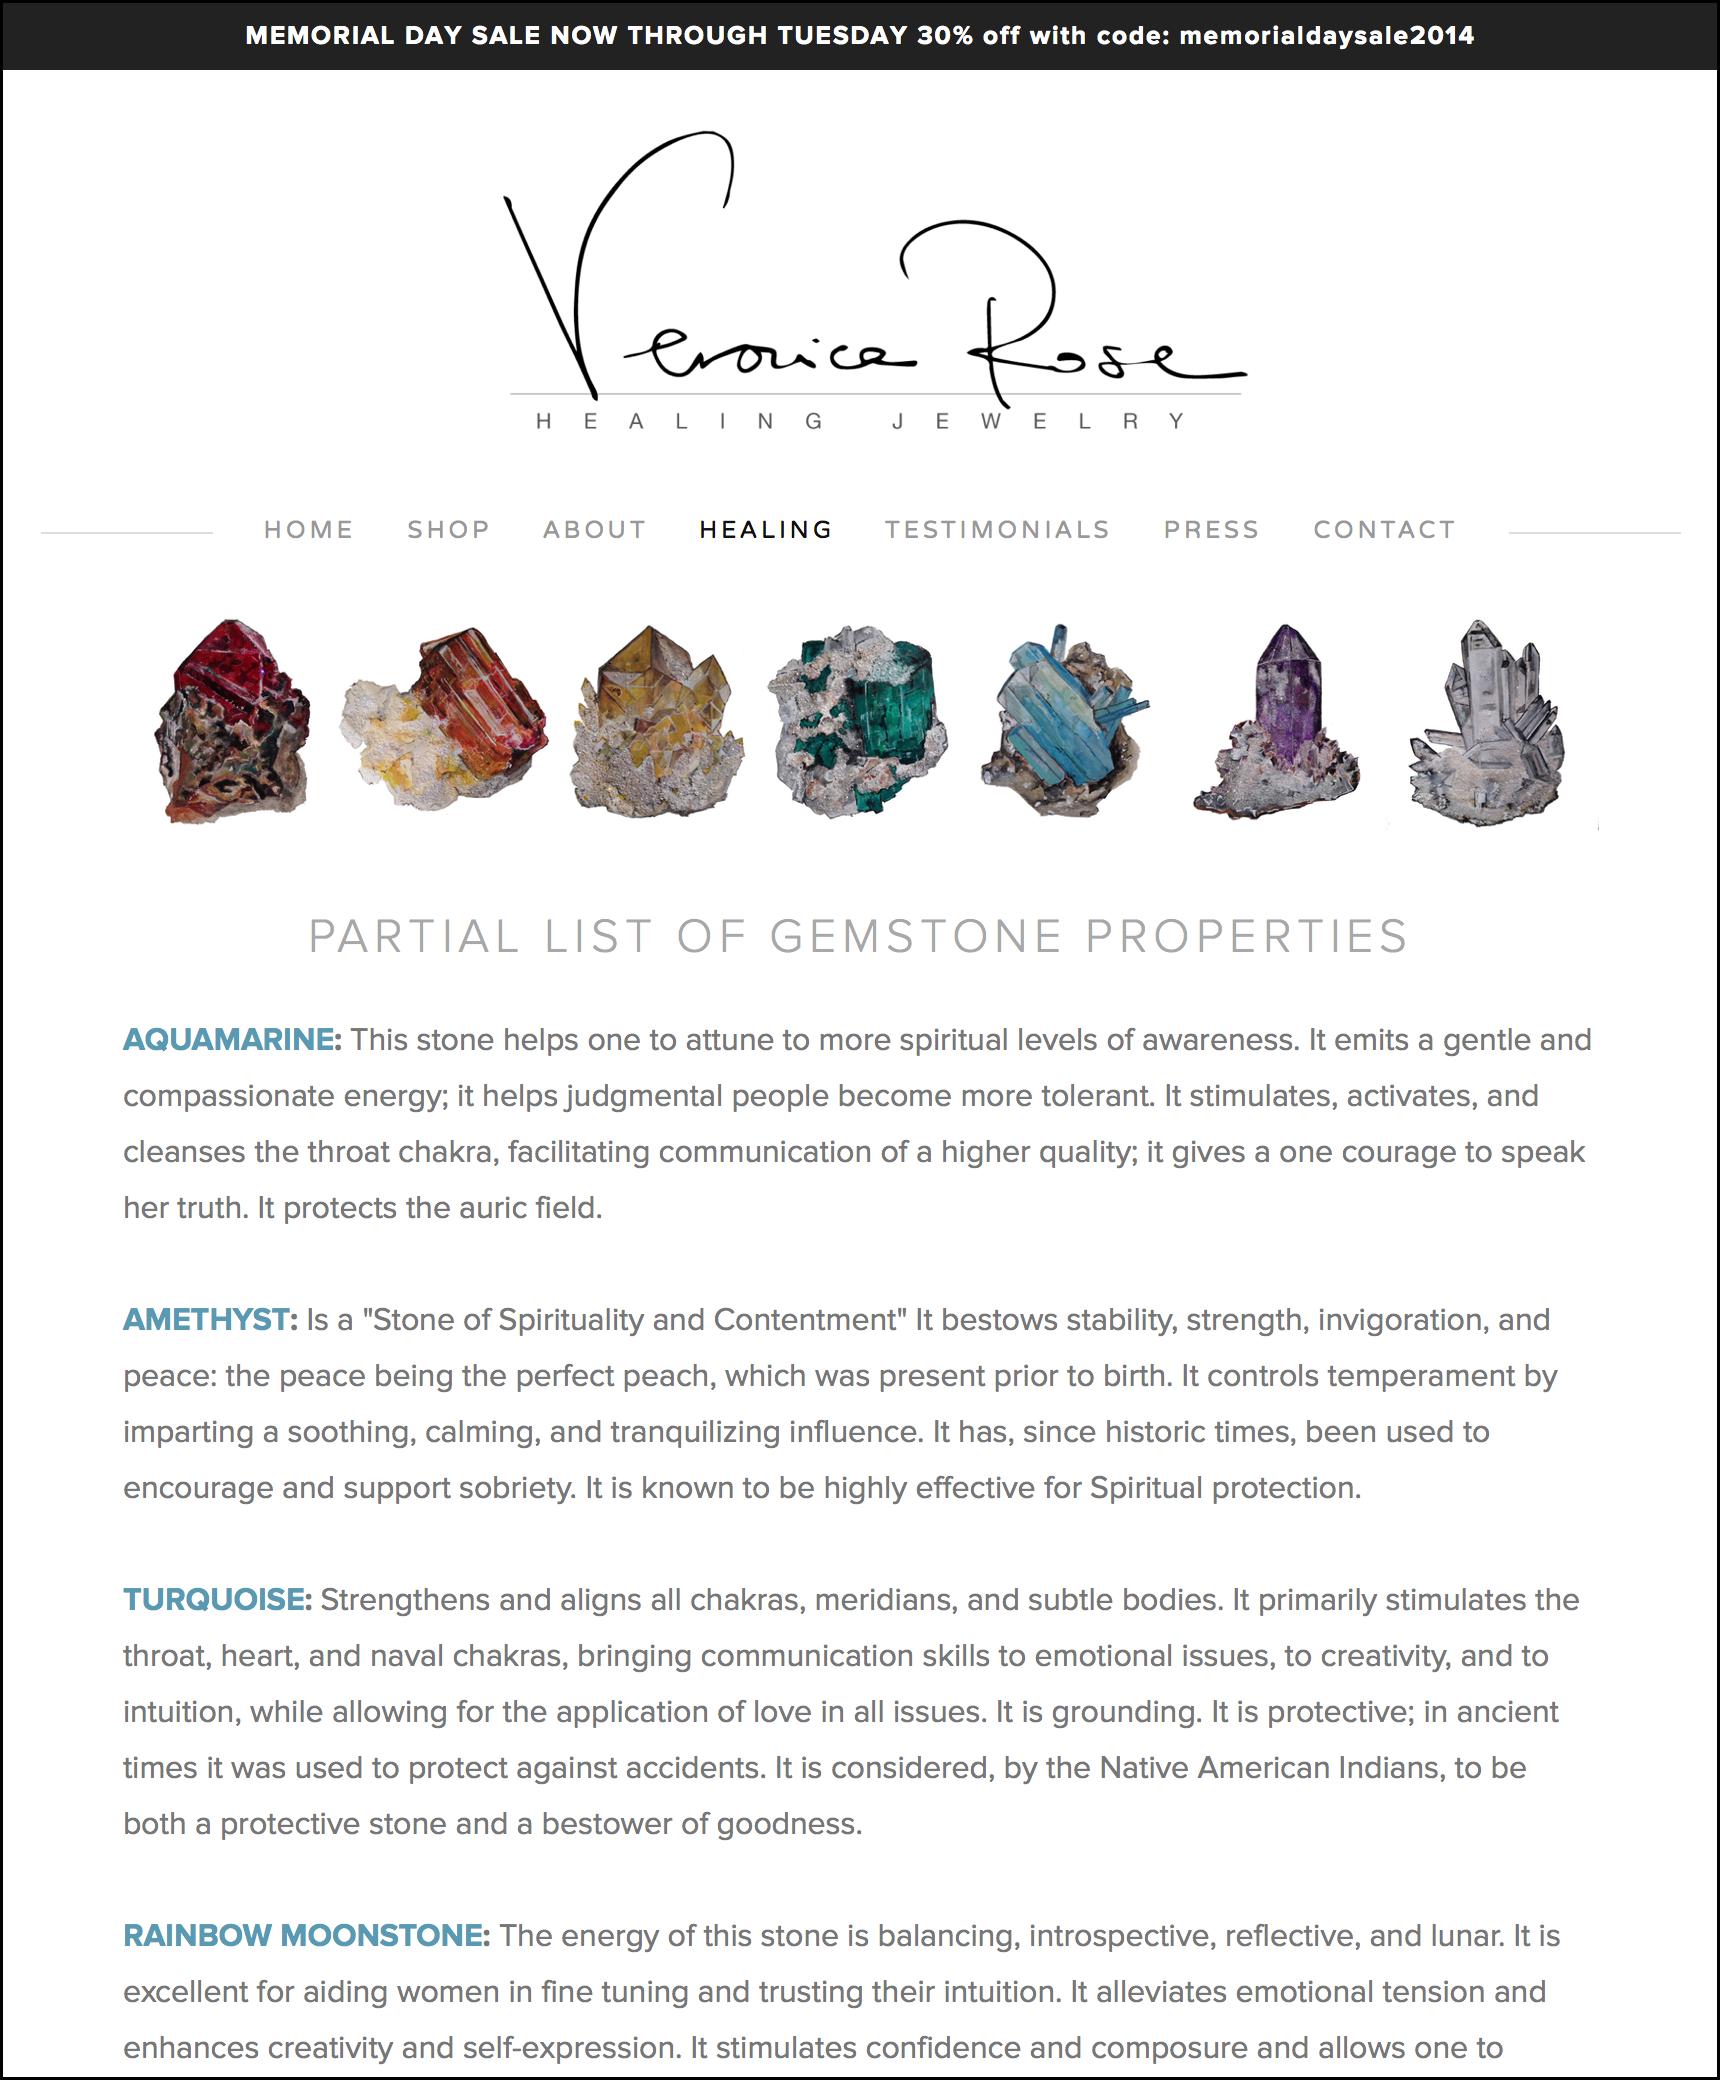 Gemstone-Properties-—-Veronica-Rose-Jewelry.png